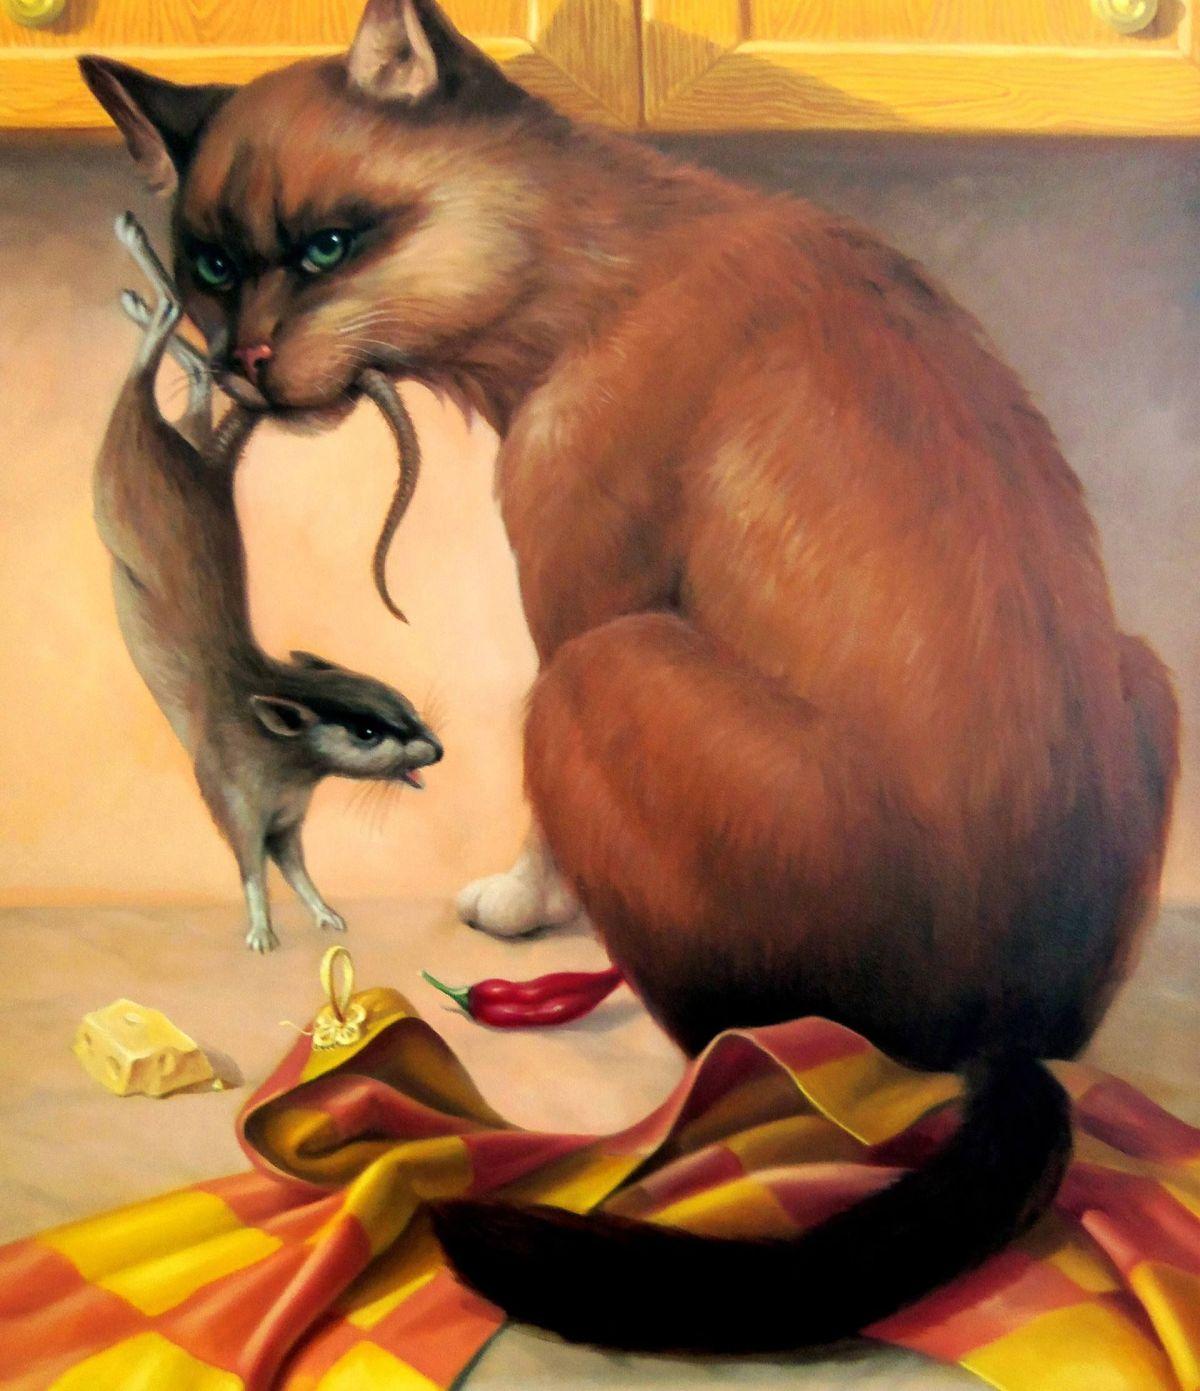 oil painting surreal by artush voskanyan